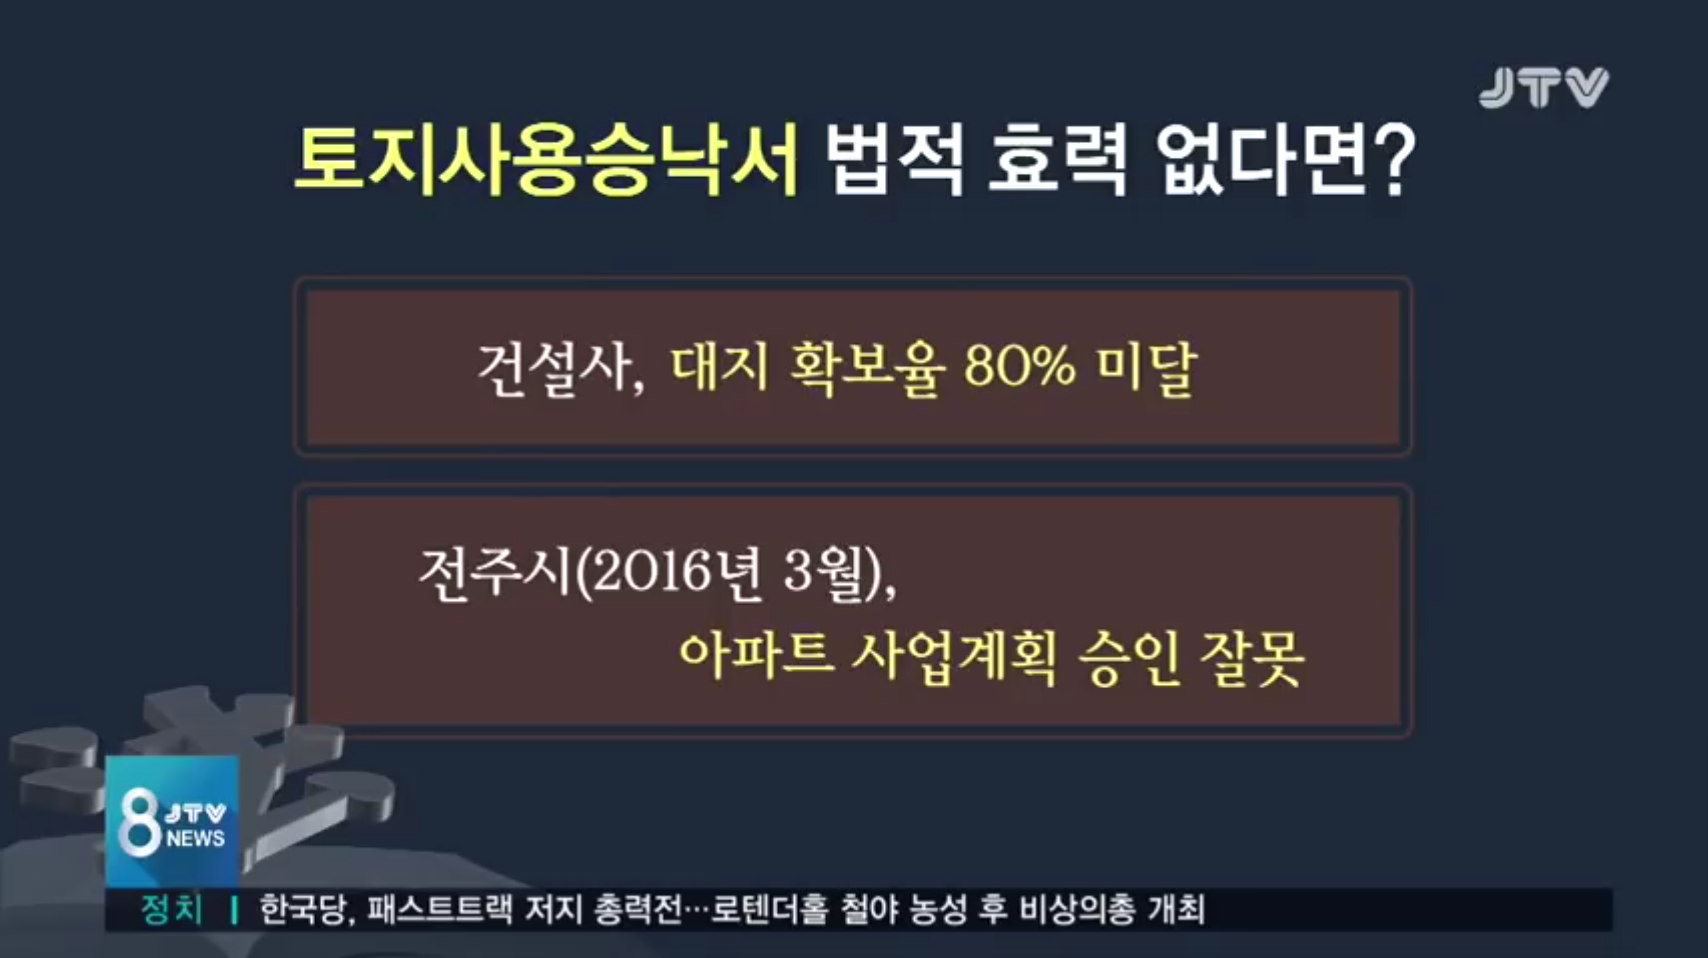 [19.4.24 JTV] 전주시, 아파트재개발 승인 허술, 정보공개 거부로 시민만 골탕6.png